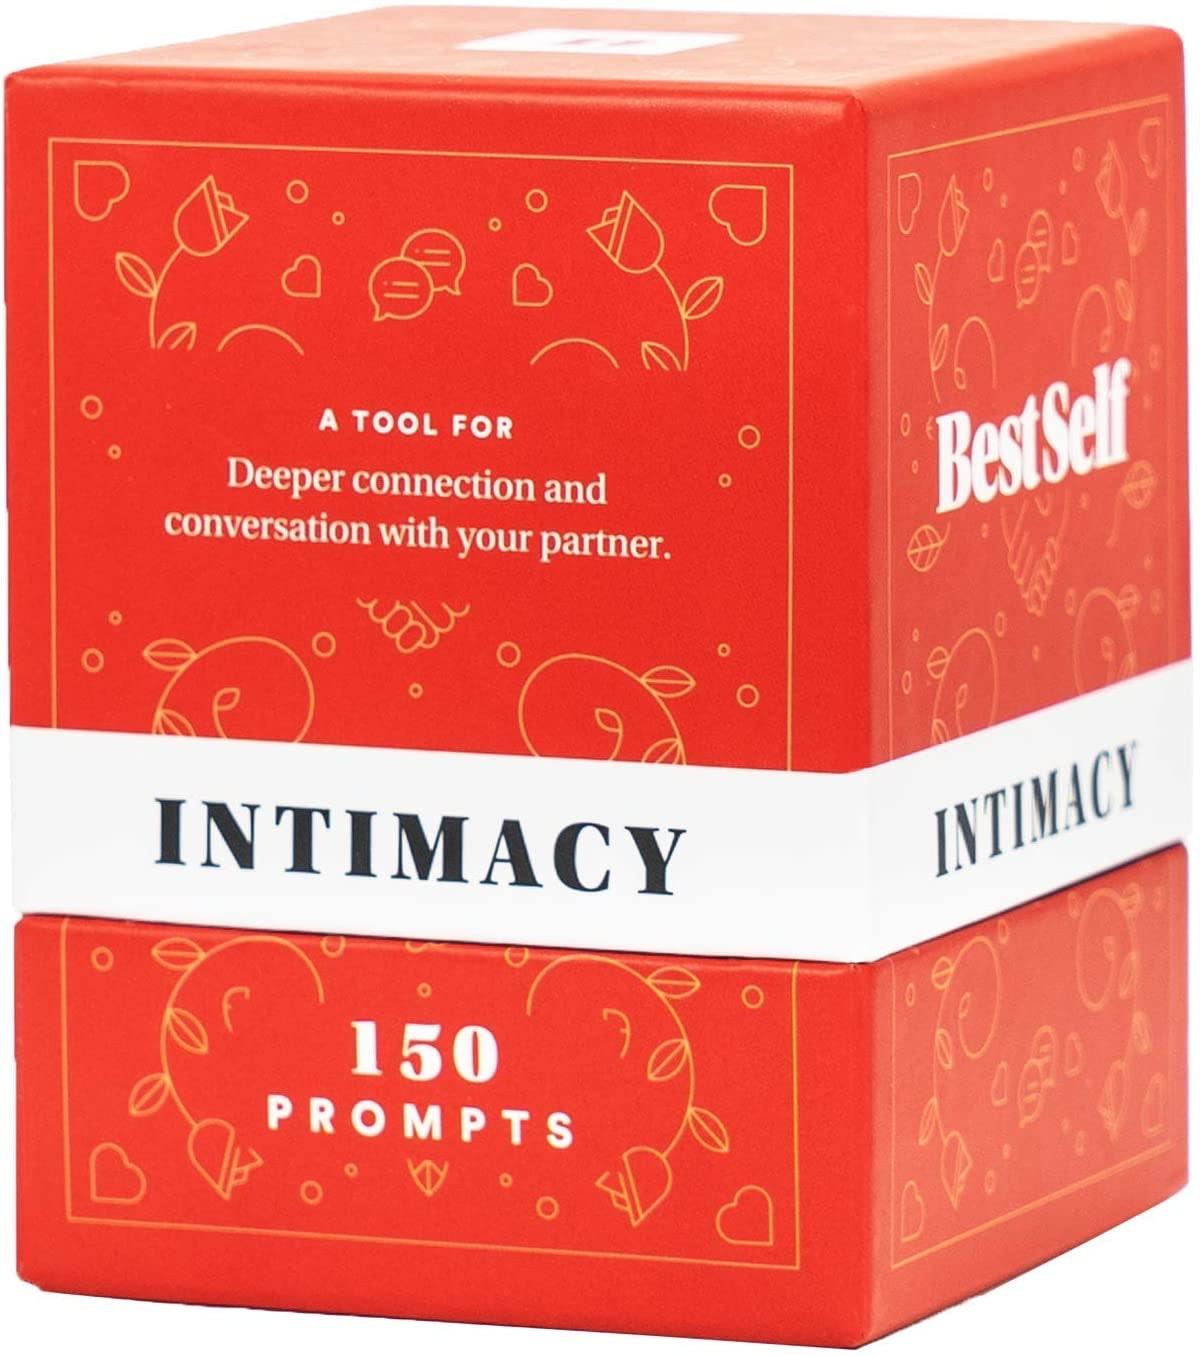 Intimacy by Best Self